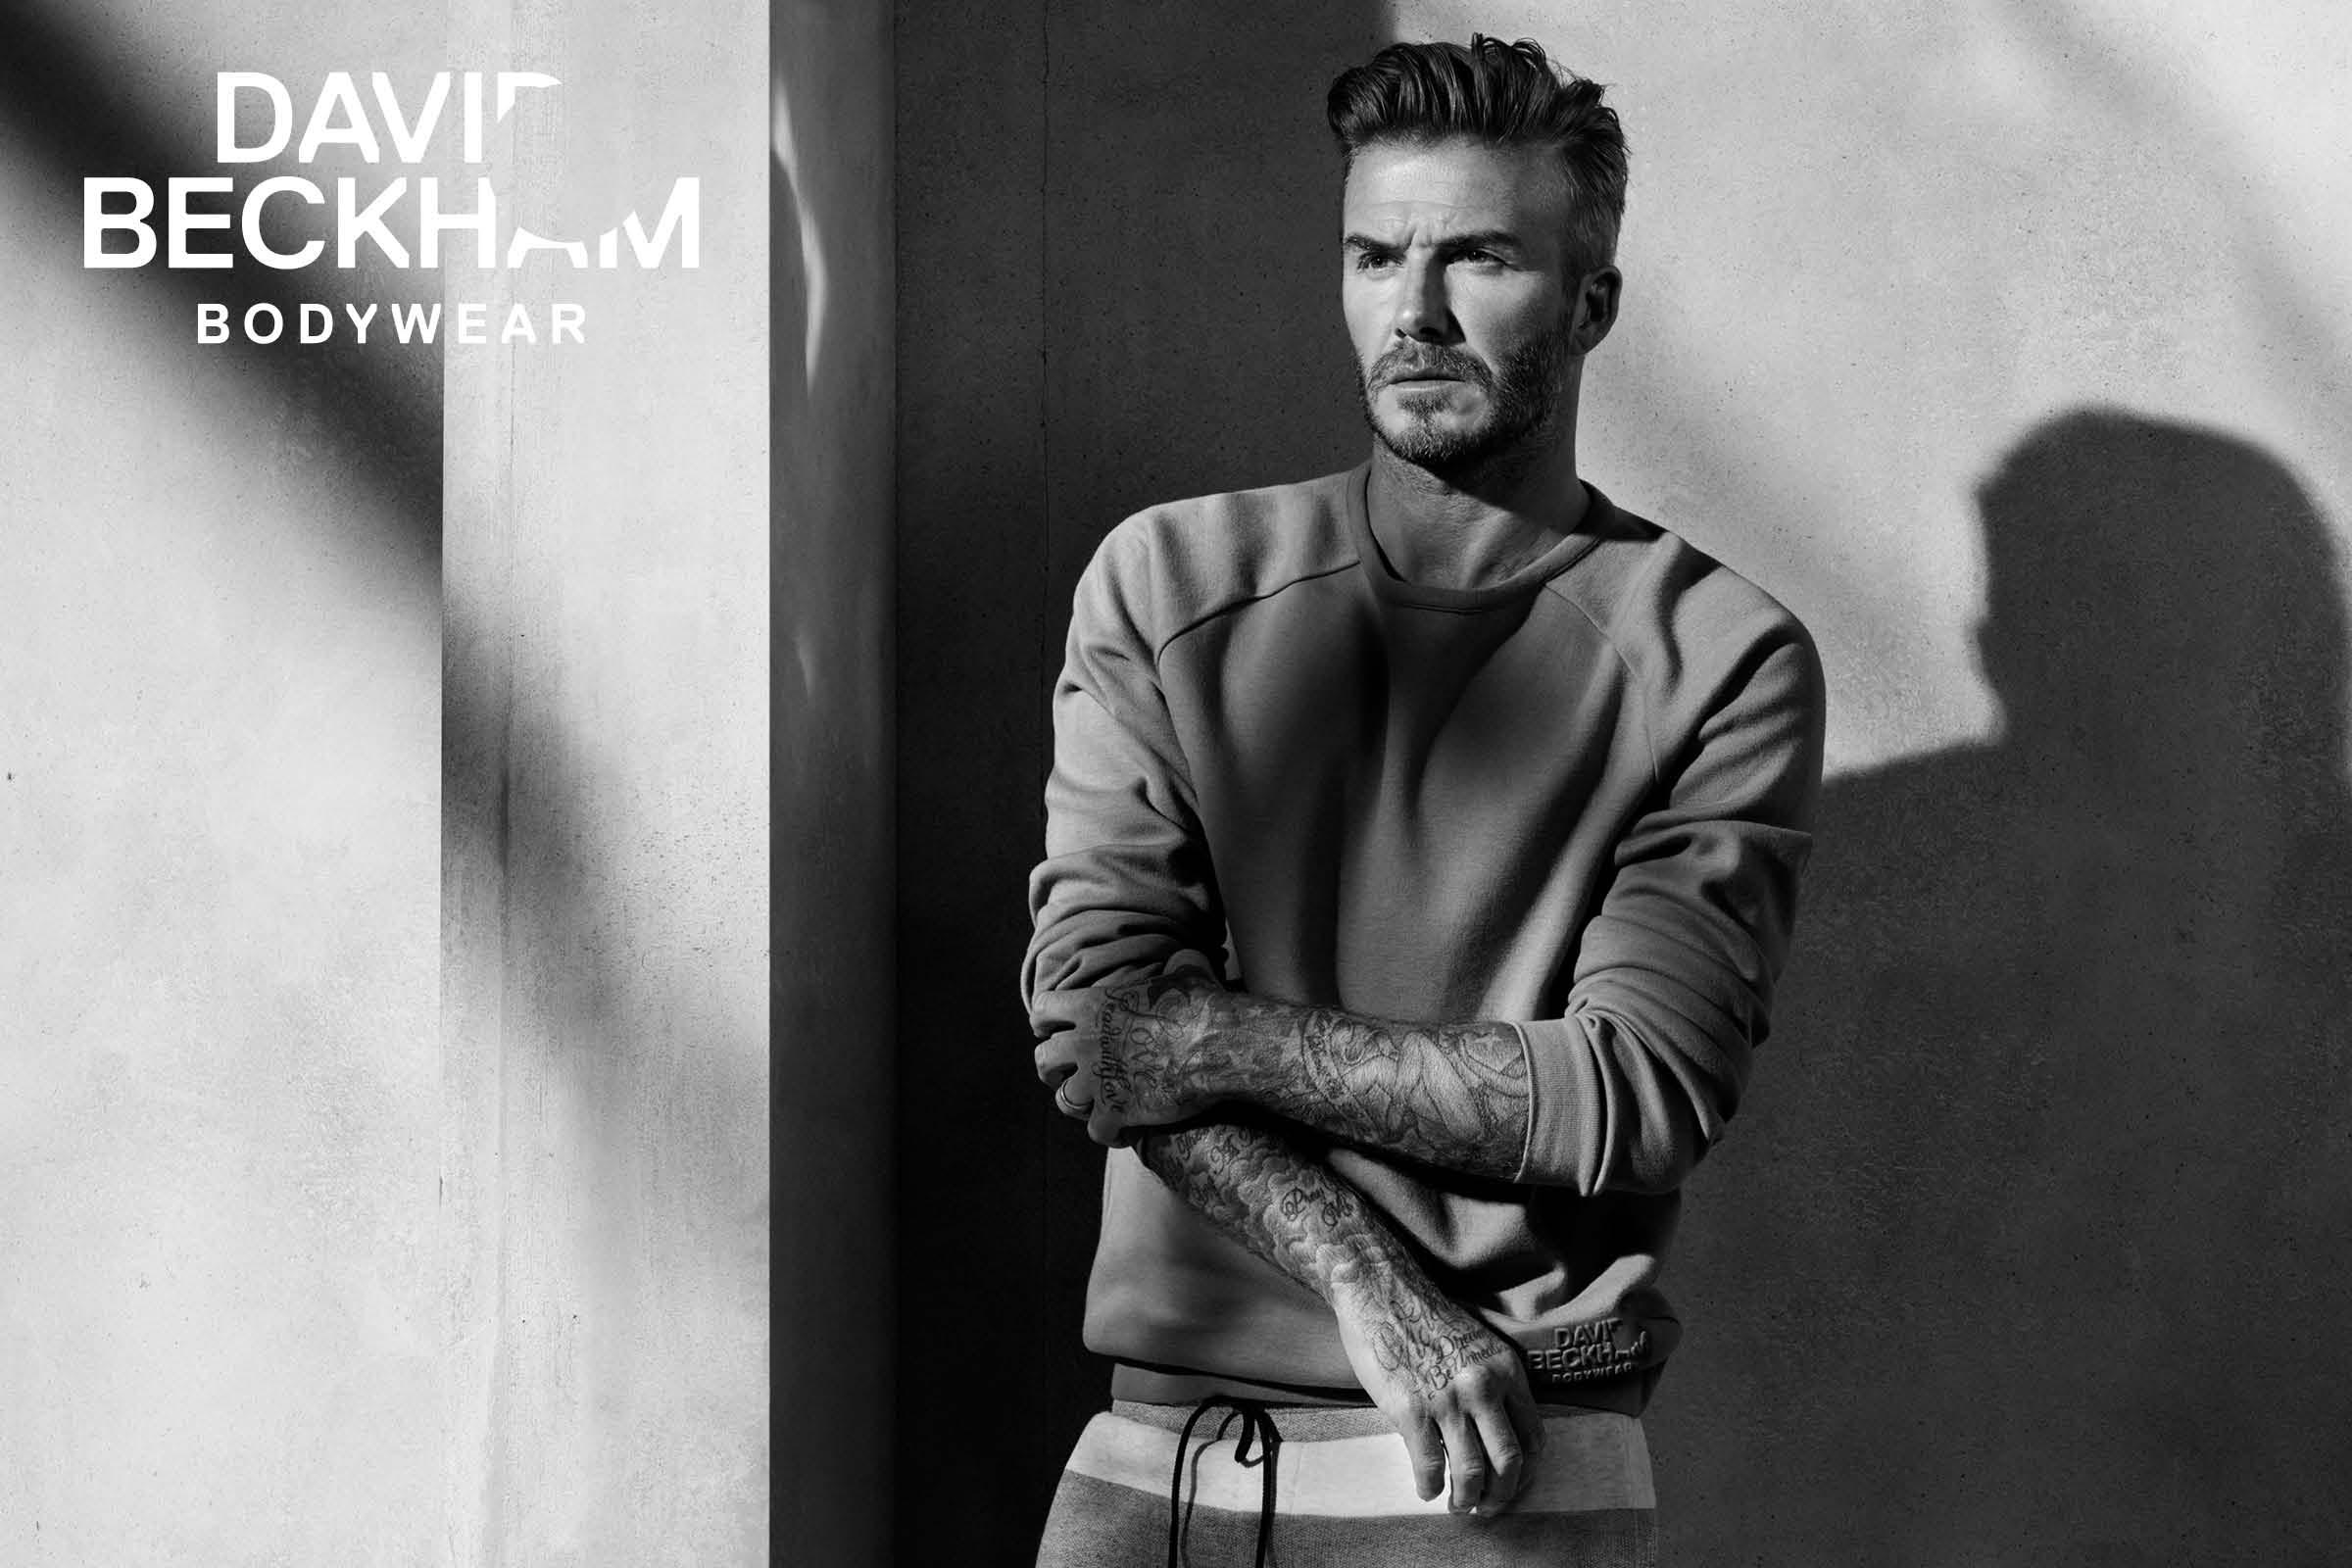 5PB-Beckham-Bodywear-CPD-3-en_GEN.jpg